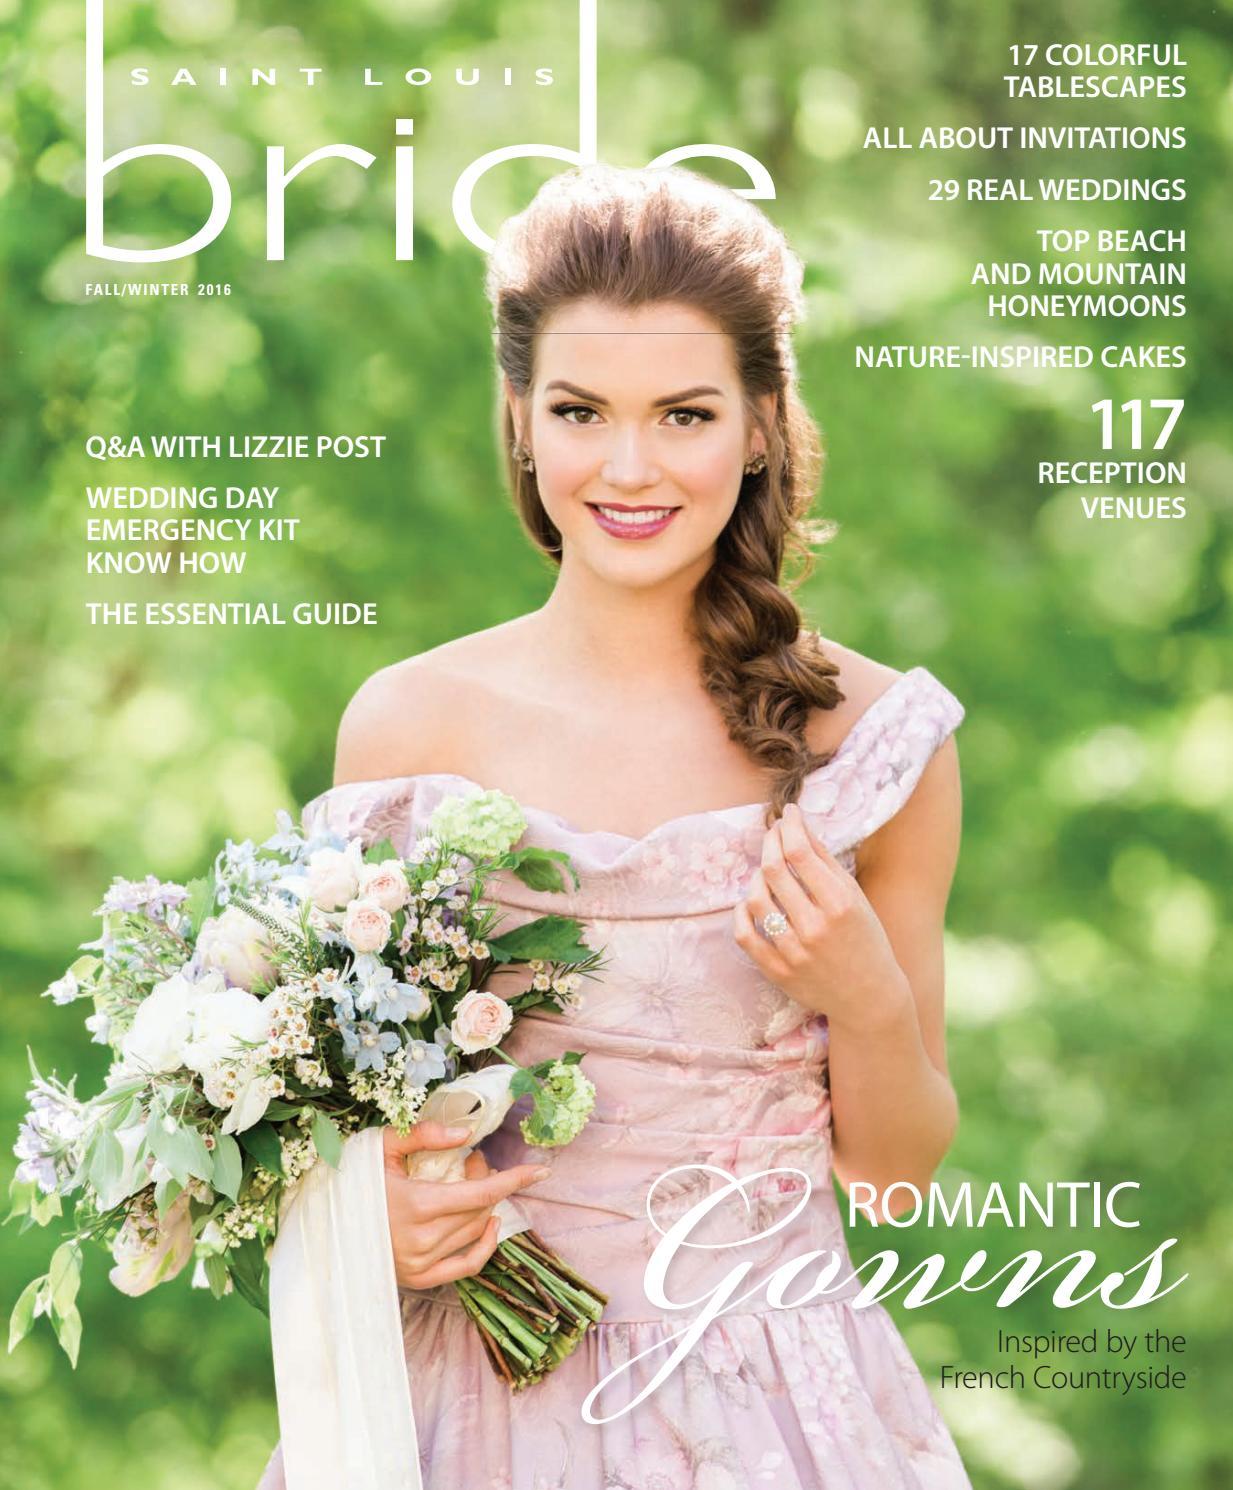 St. Louis Bride Fall-Winter 2016 by Morris Media Network - issuu